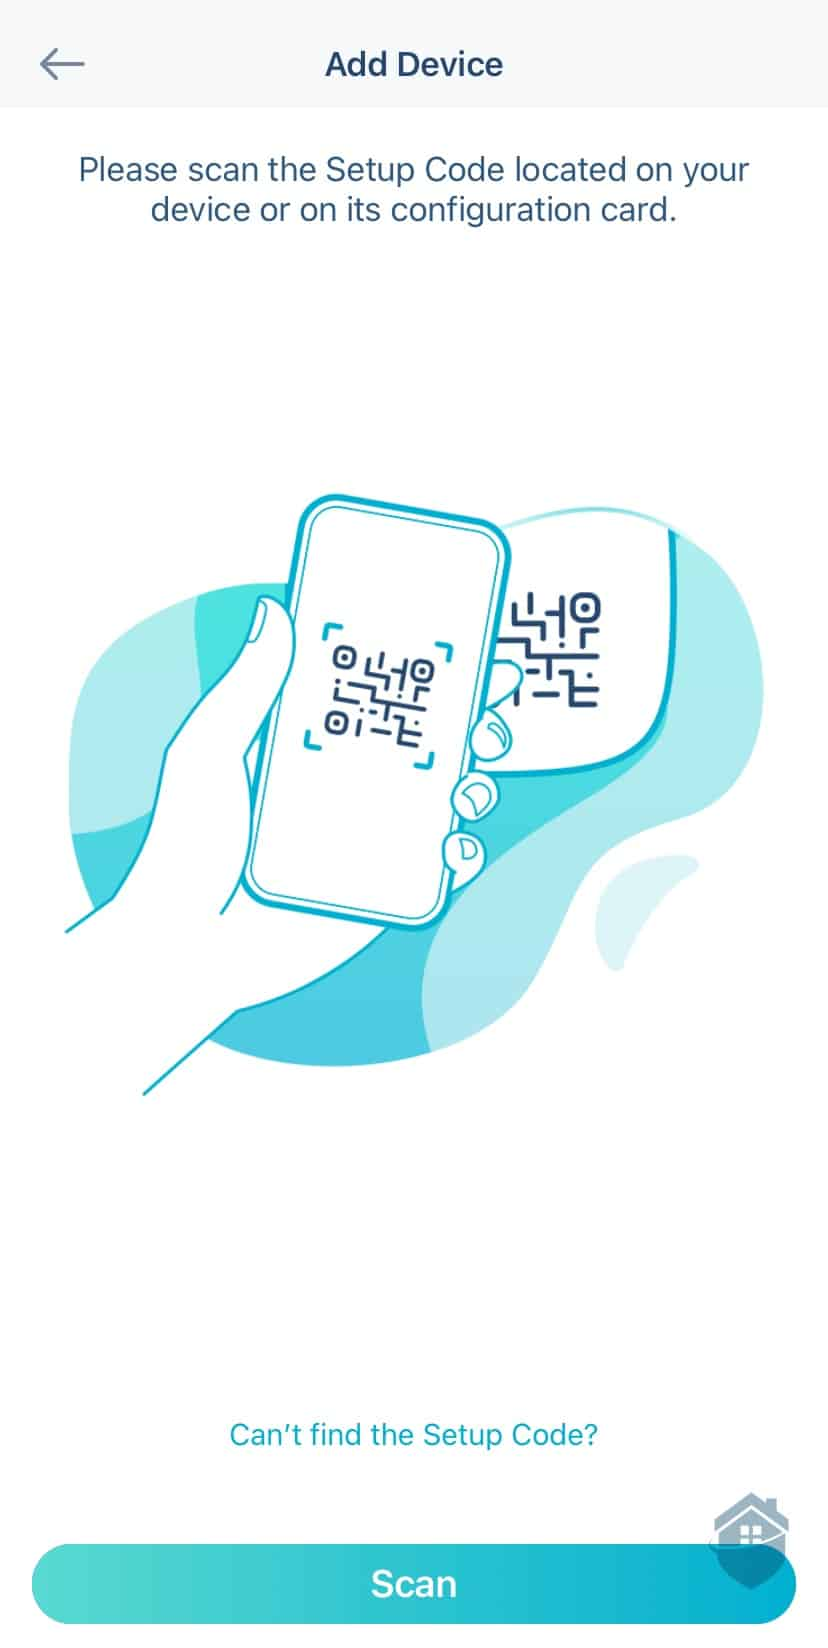 D-Link App - Add Device